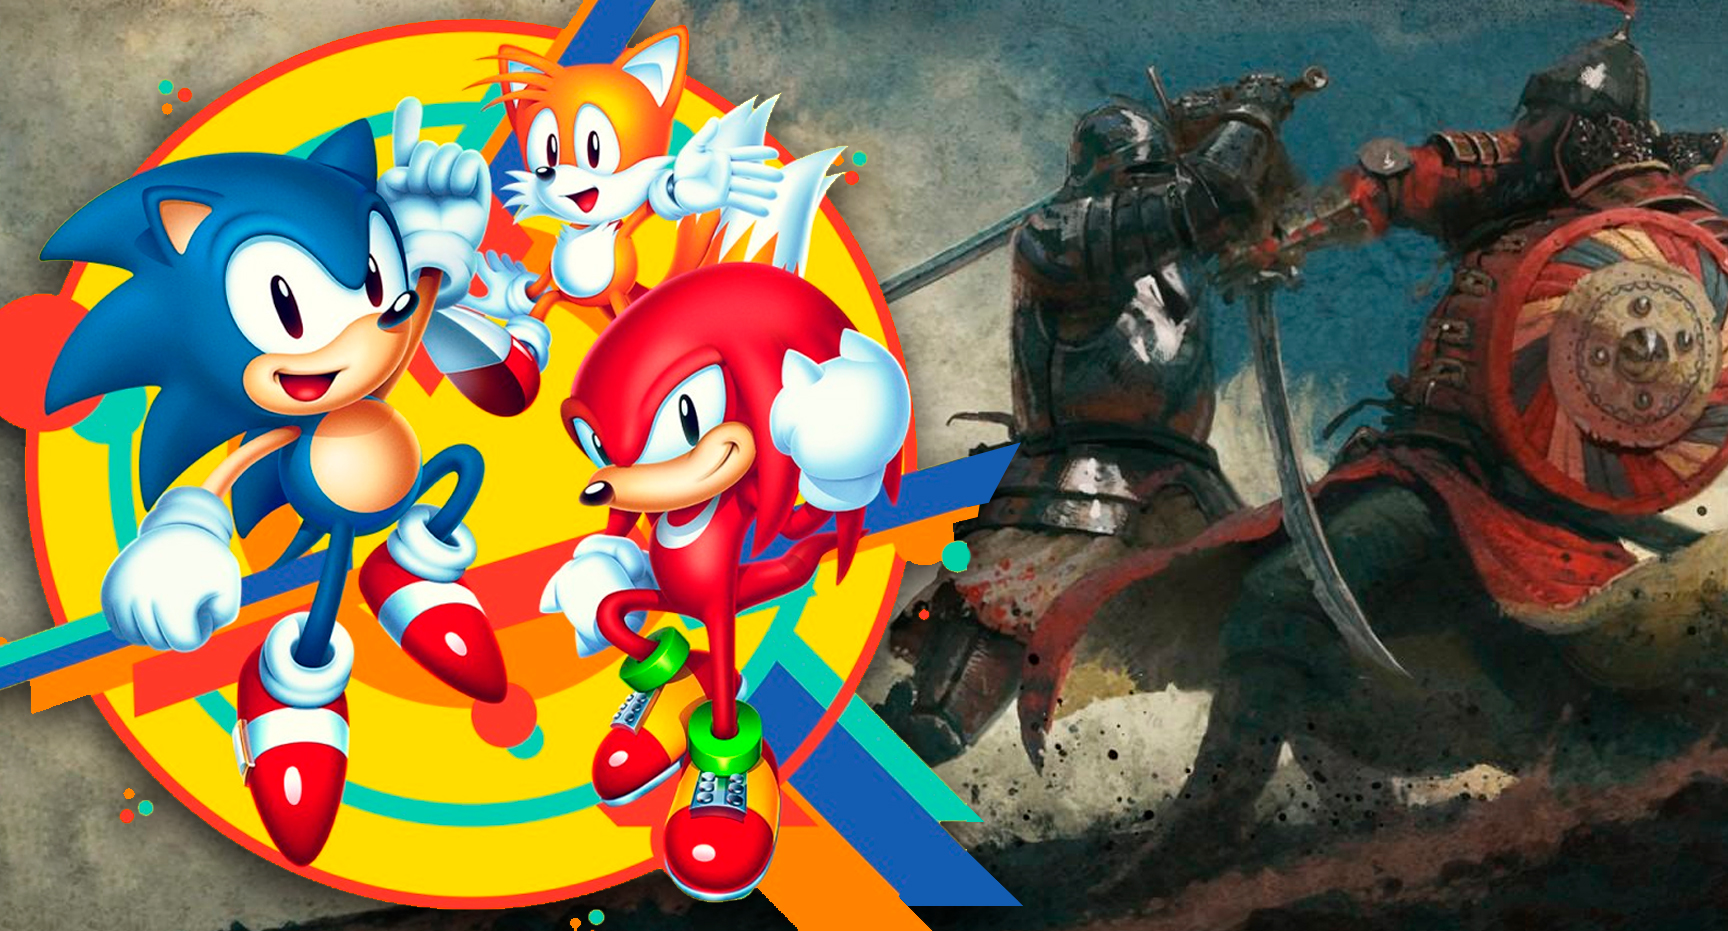 Este fin de semana tenemos 8 videojuegos para descargar o probar gratis en PC y Xbox One